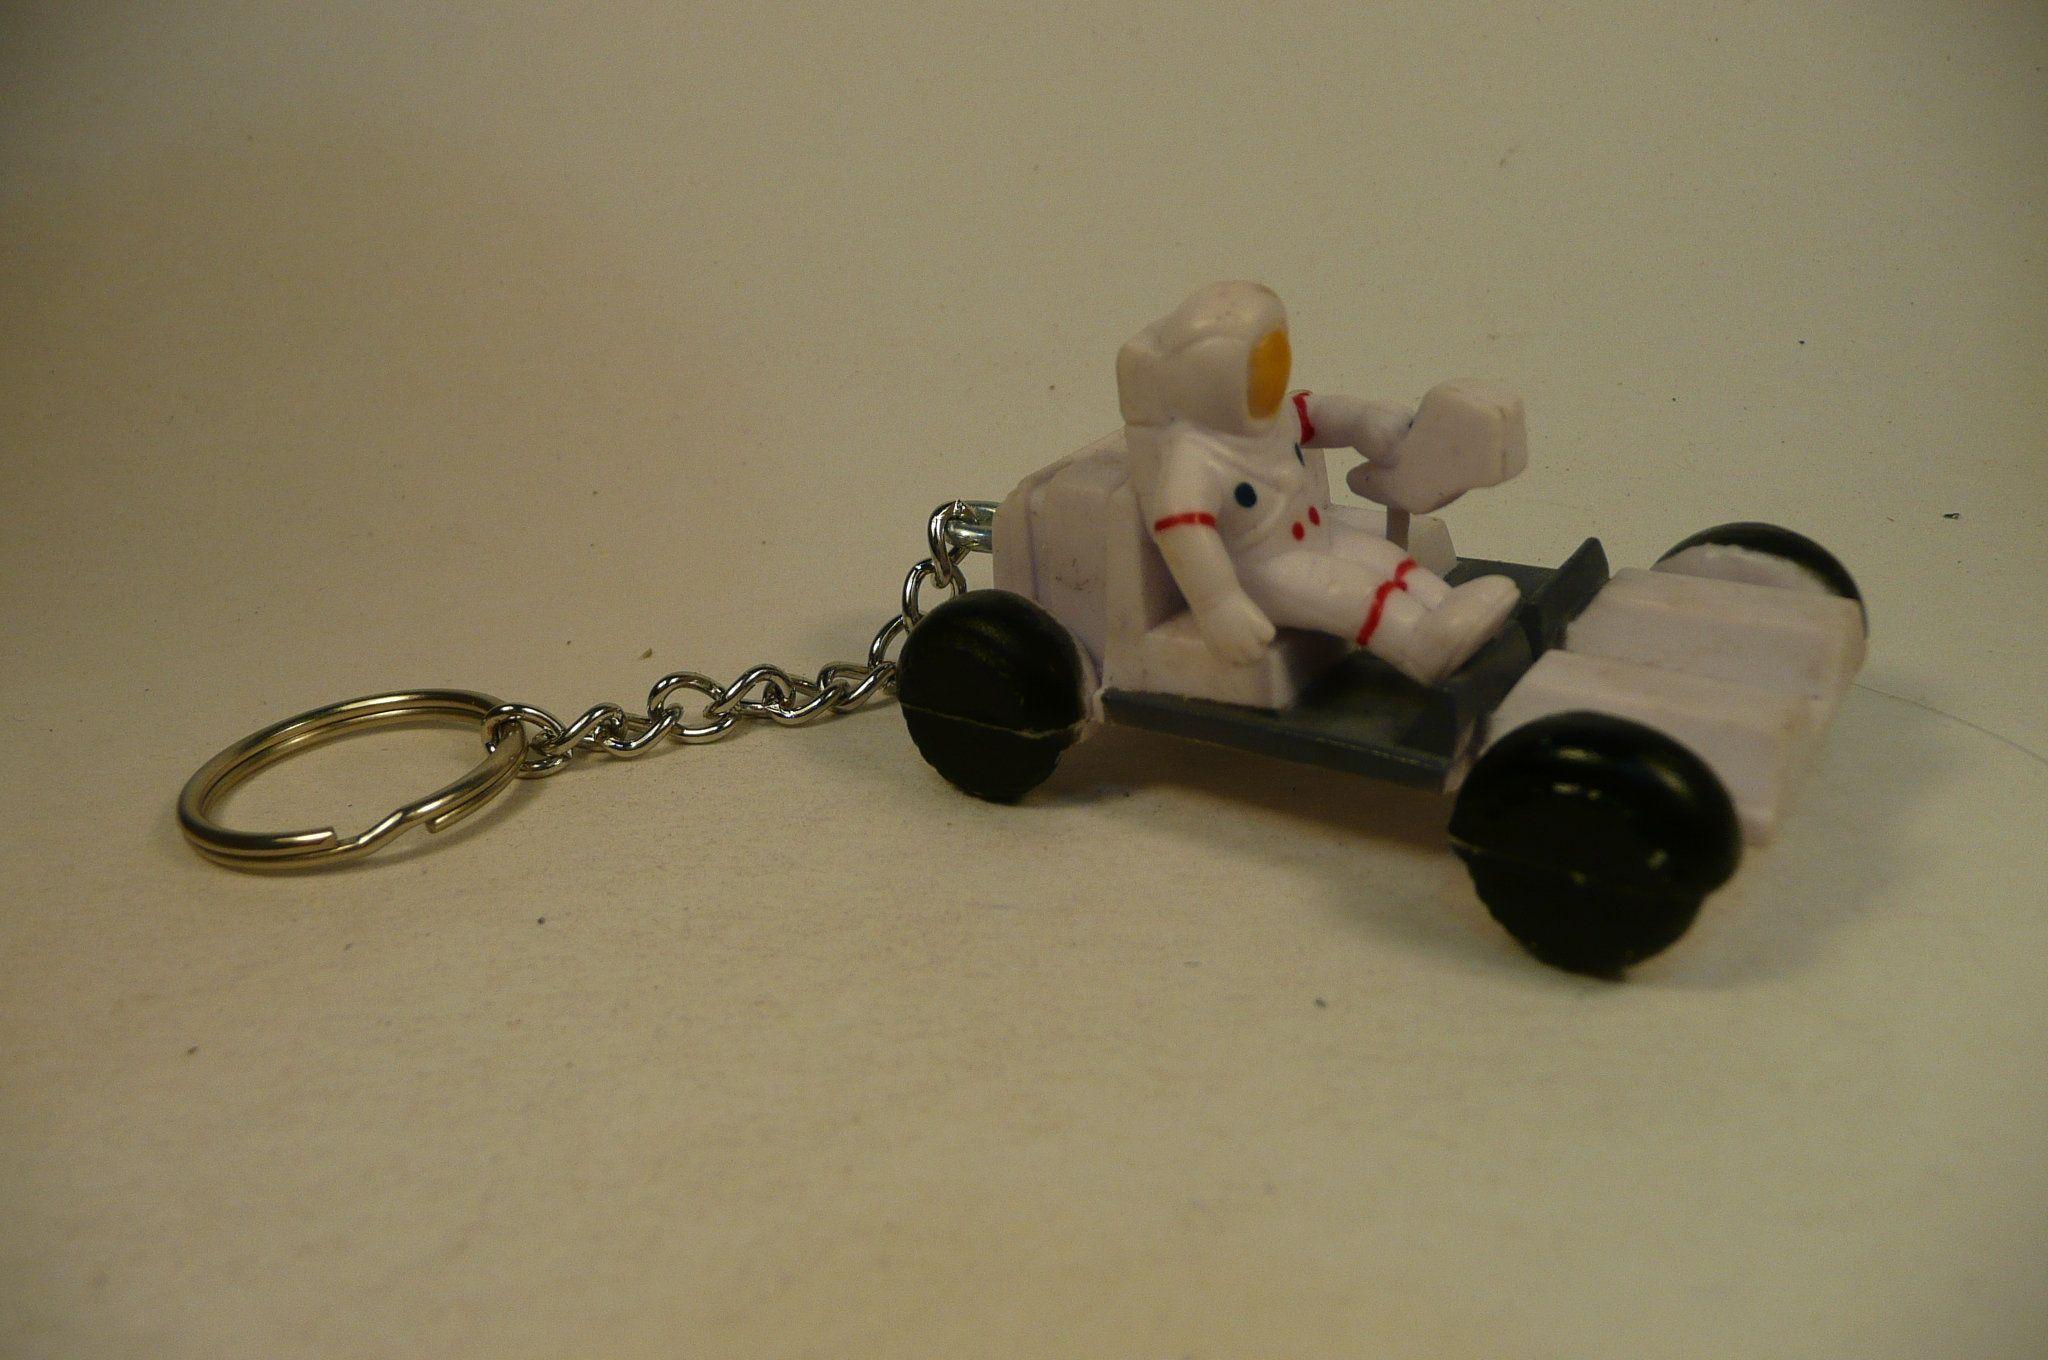 Keychain LUNAR ROVER NASA moon buggy rover  key chain